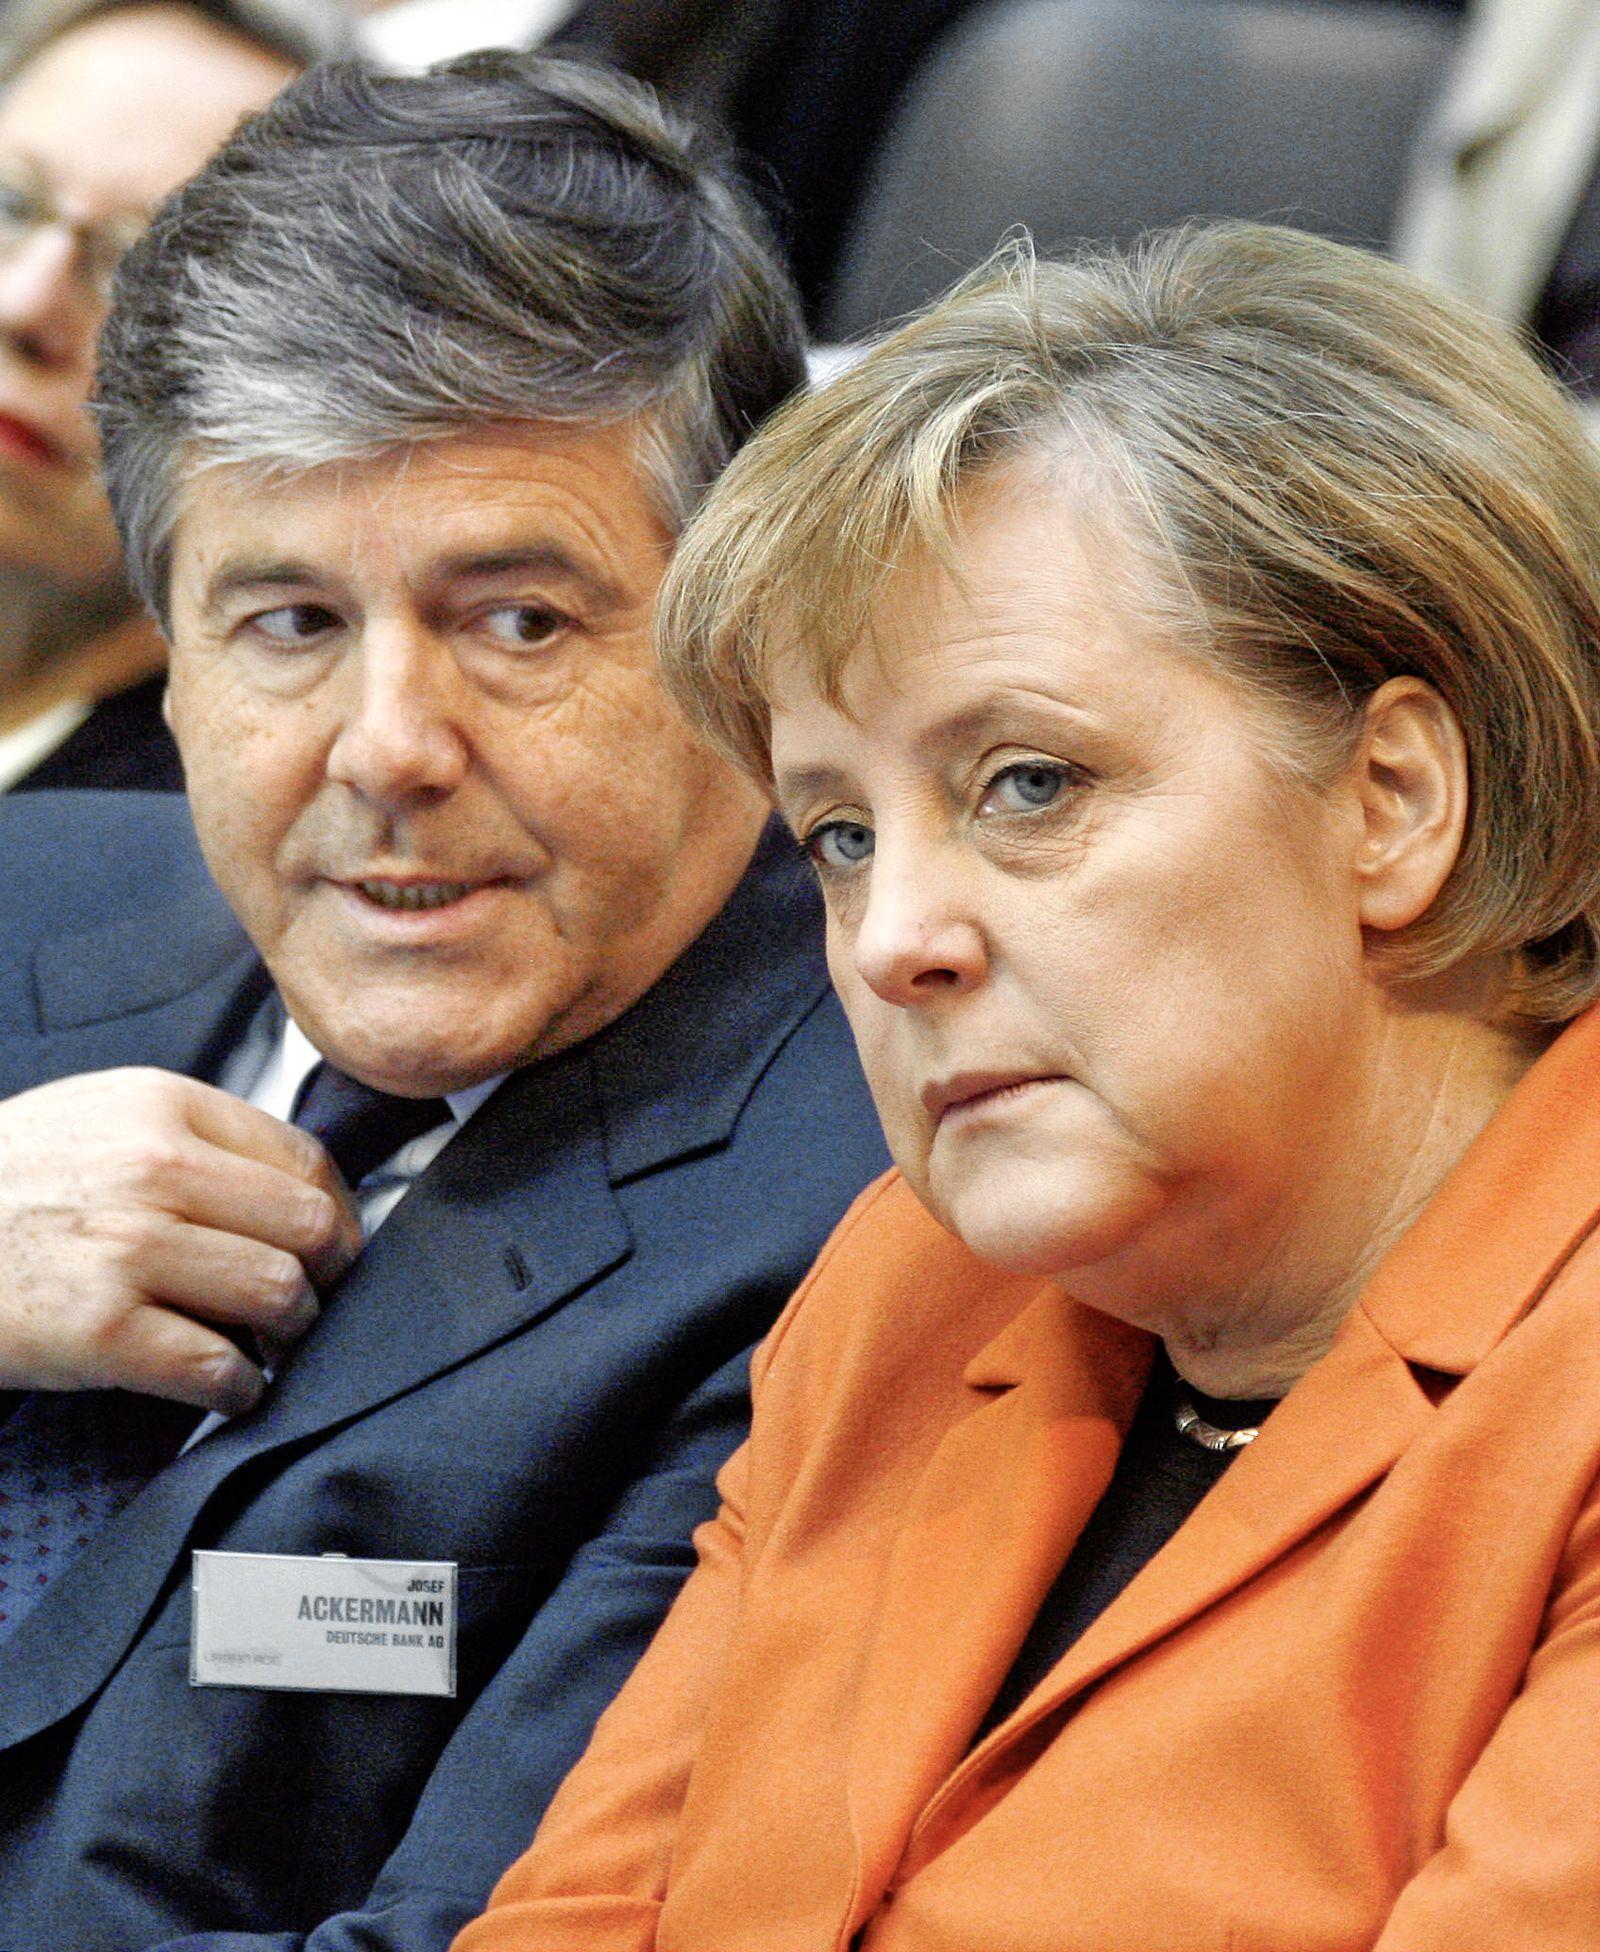 Ackermann Merkel (10.11.2006)